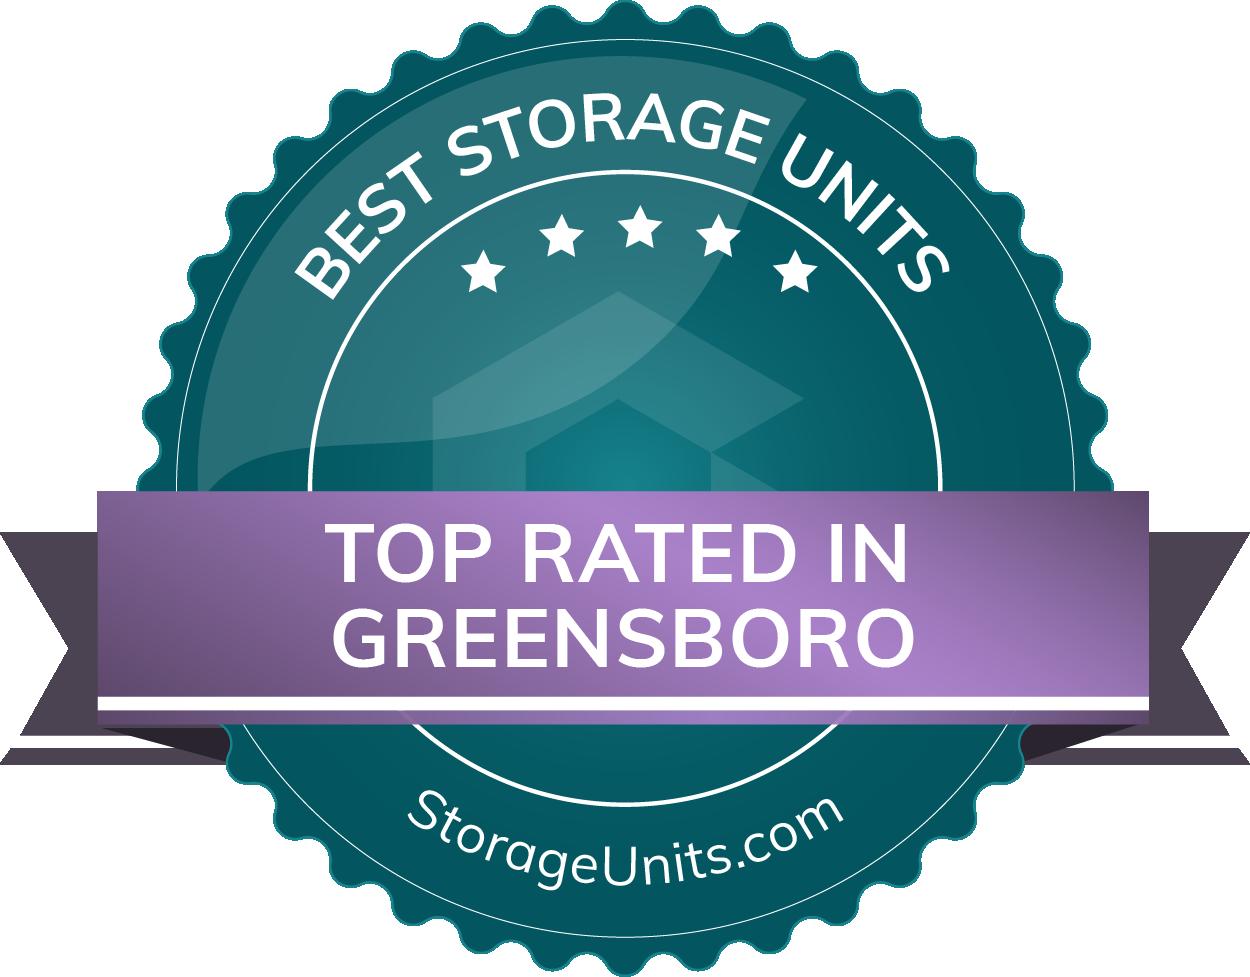 Best Self Storage Units in Greensboro, NC